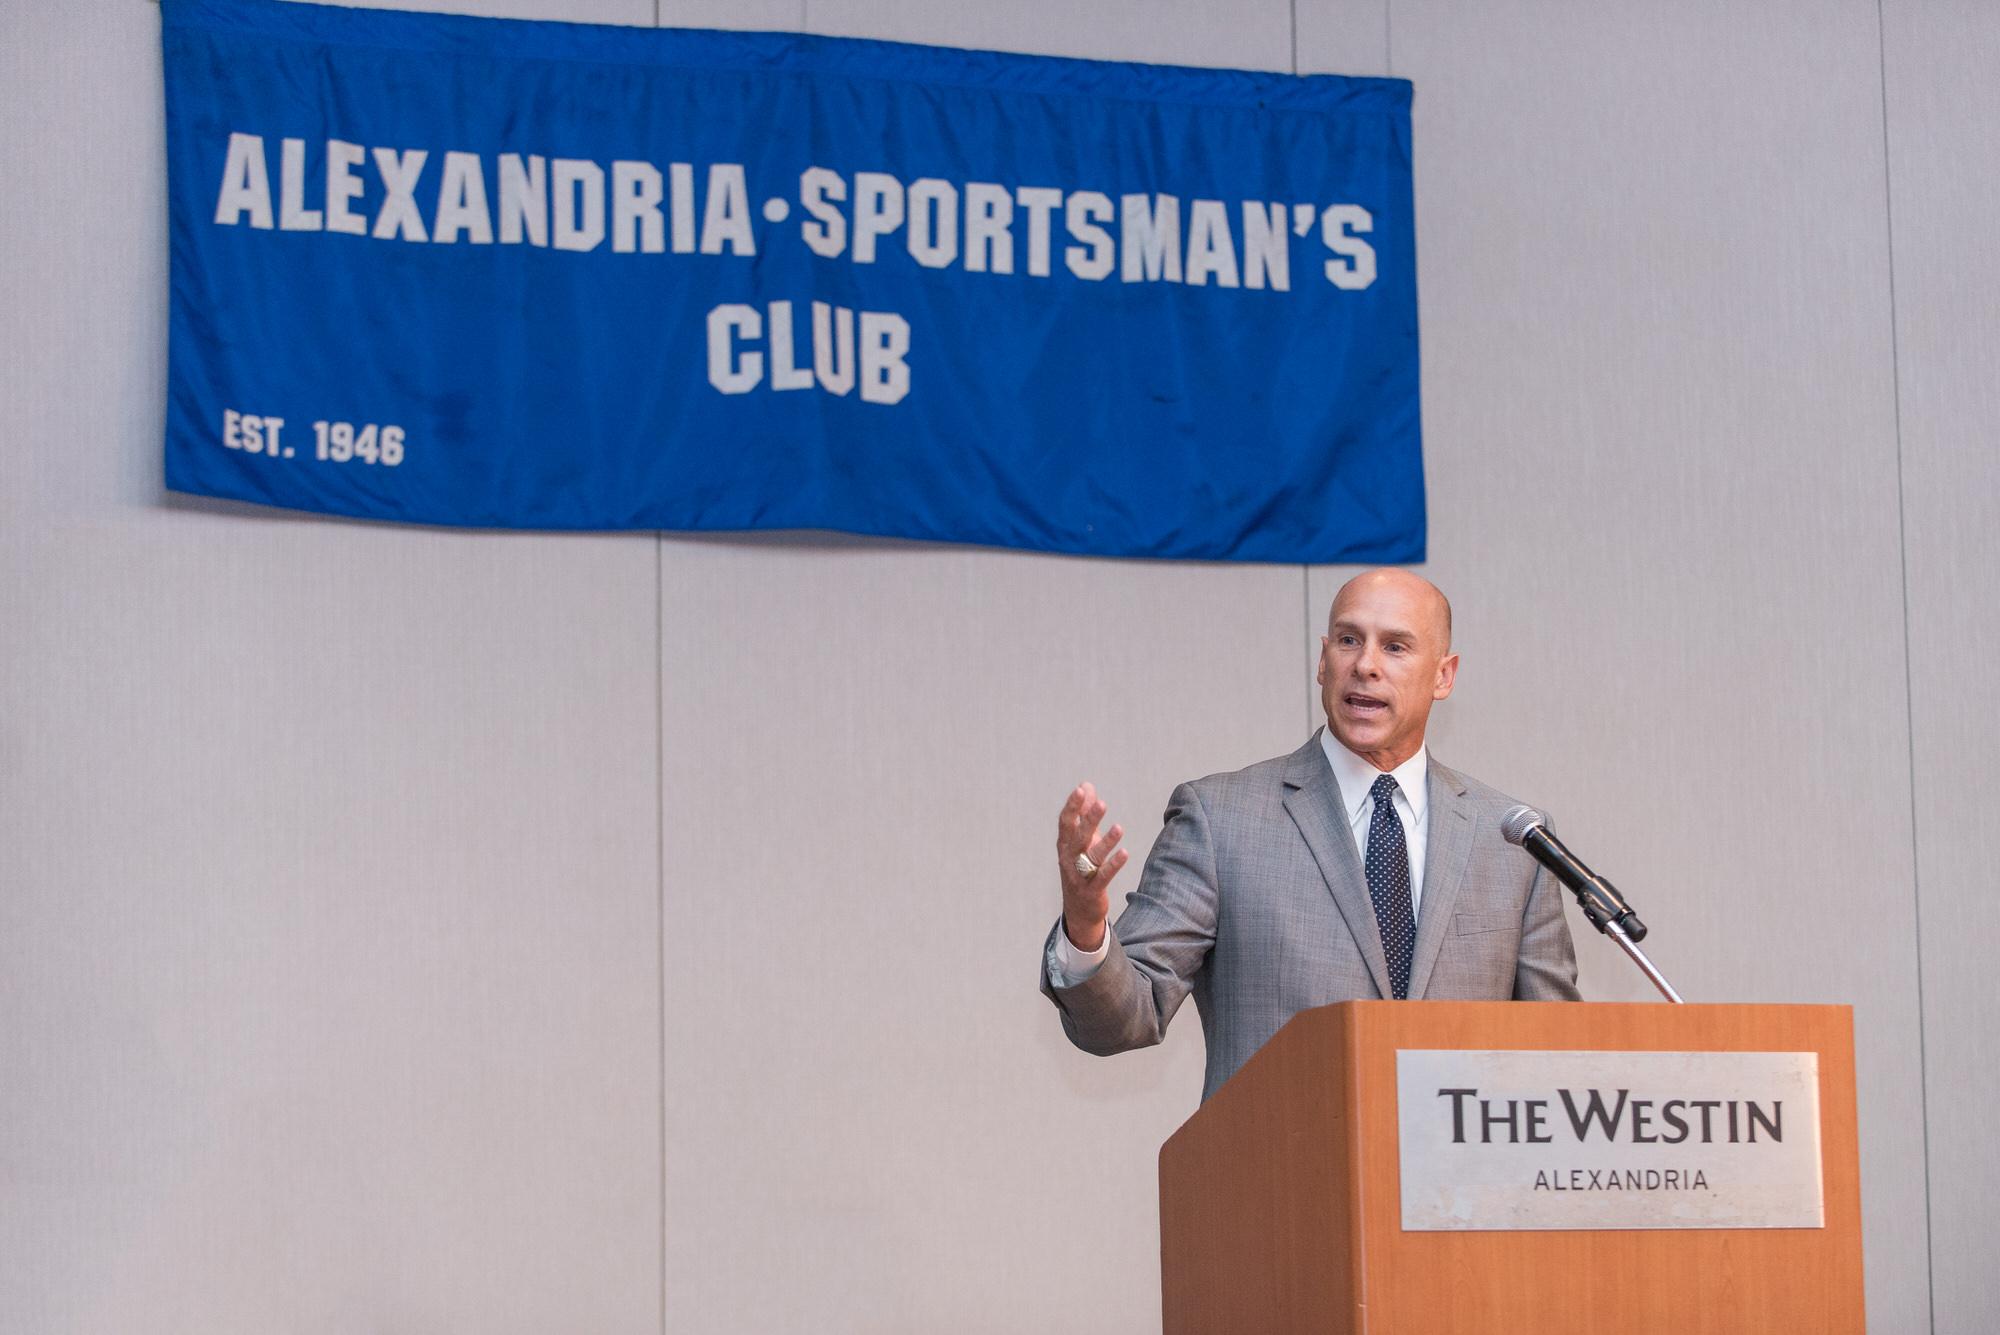 Alexandria Sportsmans Club Photographer / Photography